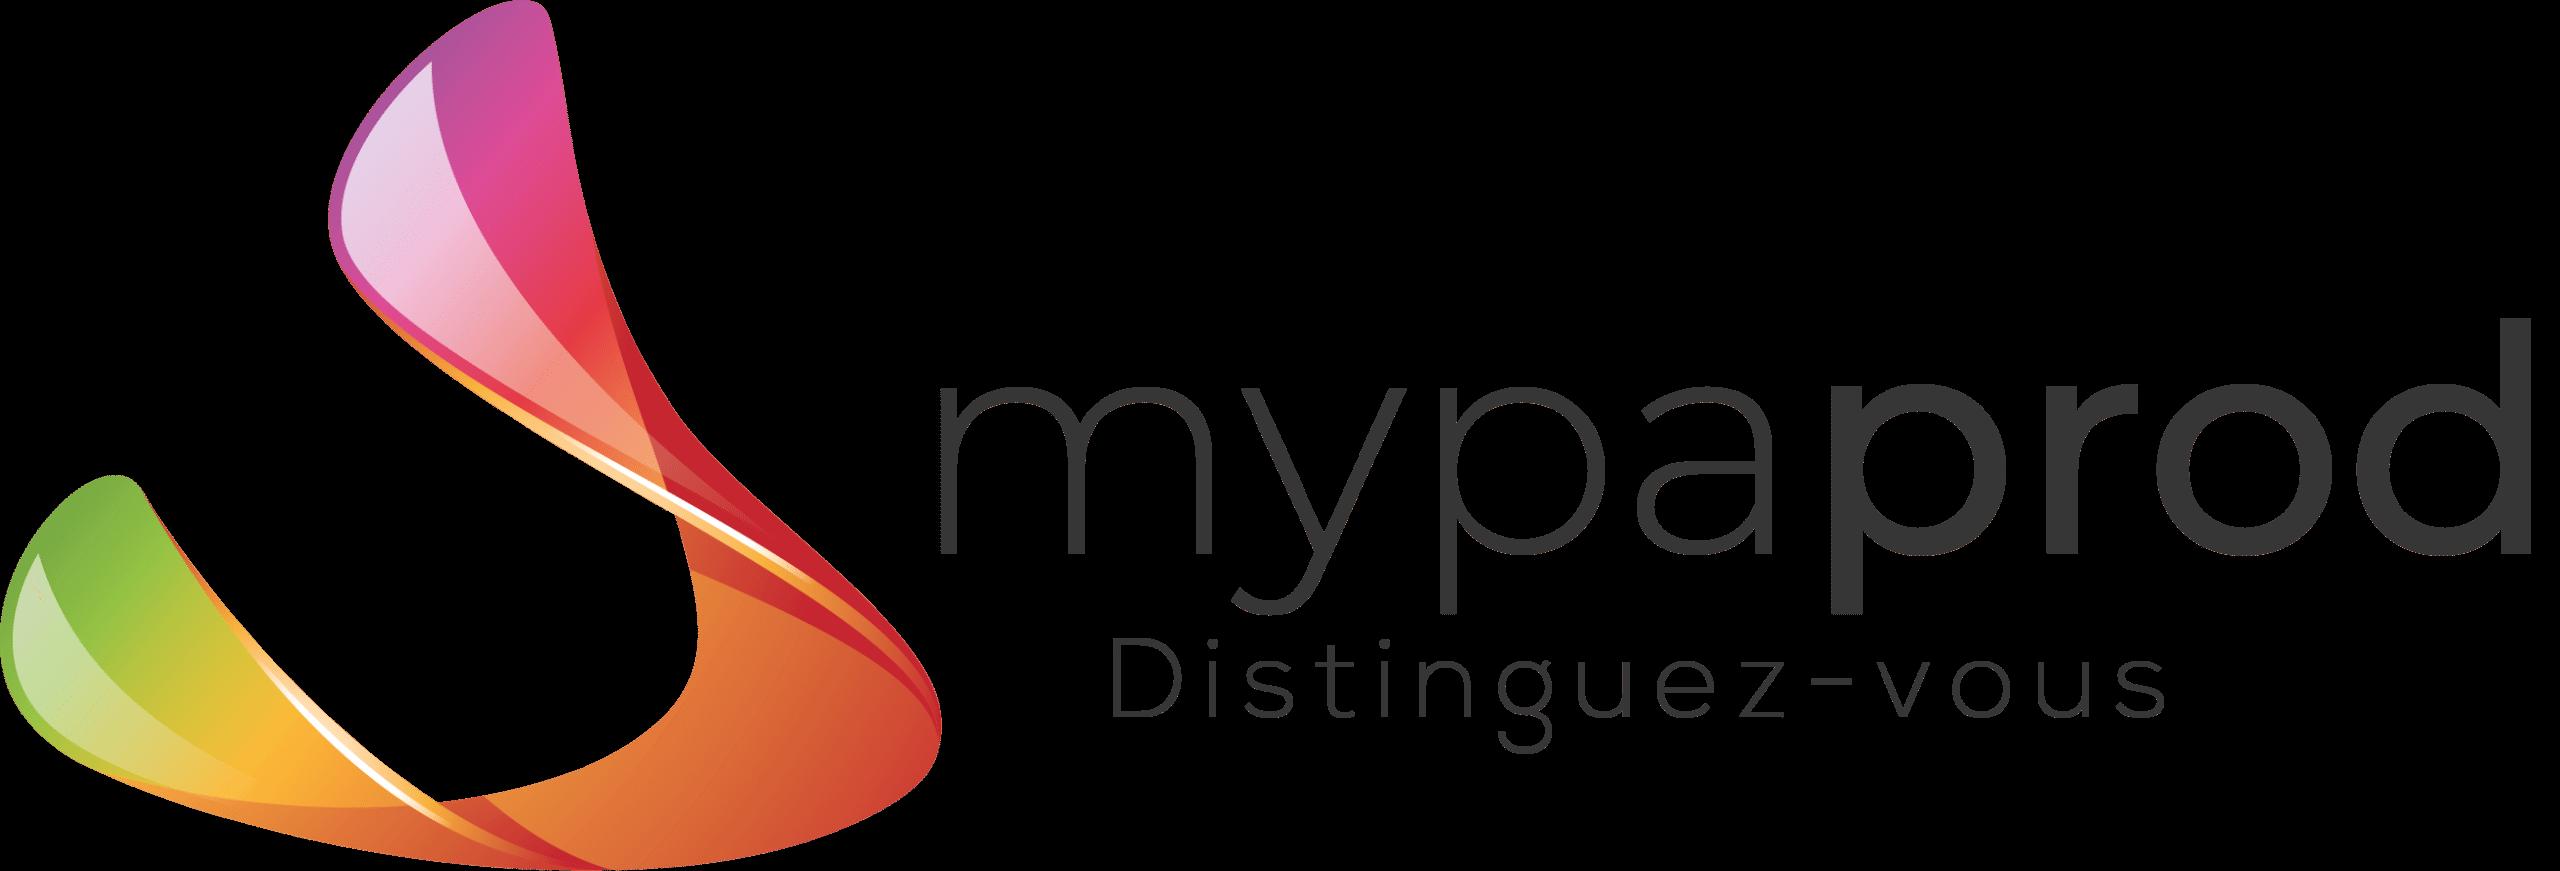 logo mypaprod